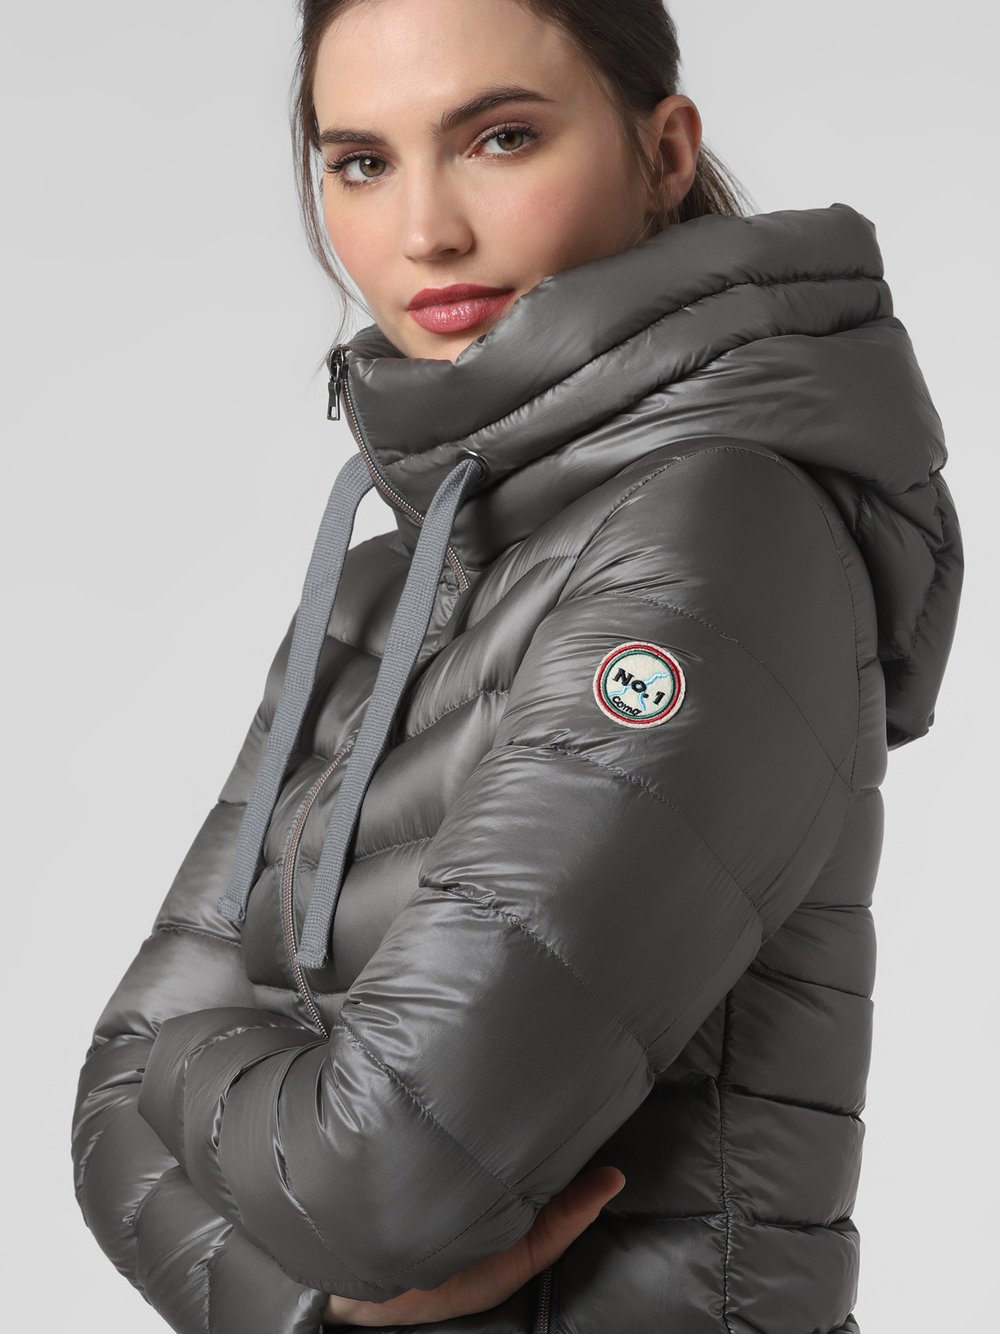 No. 1 Como Damen Daunenjacke Lara online kaufen | PEEK UND